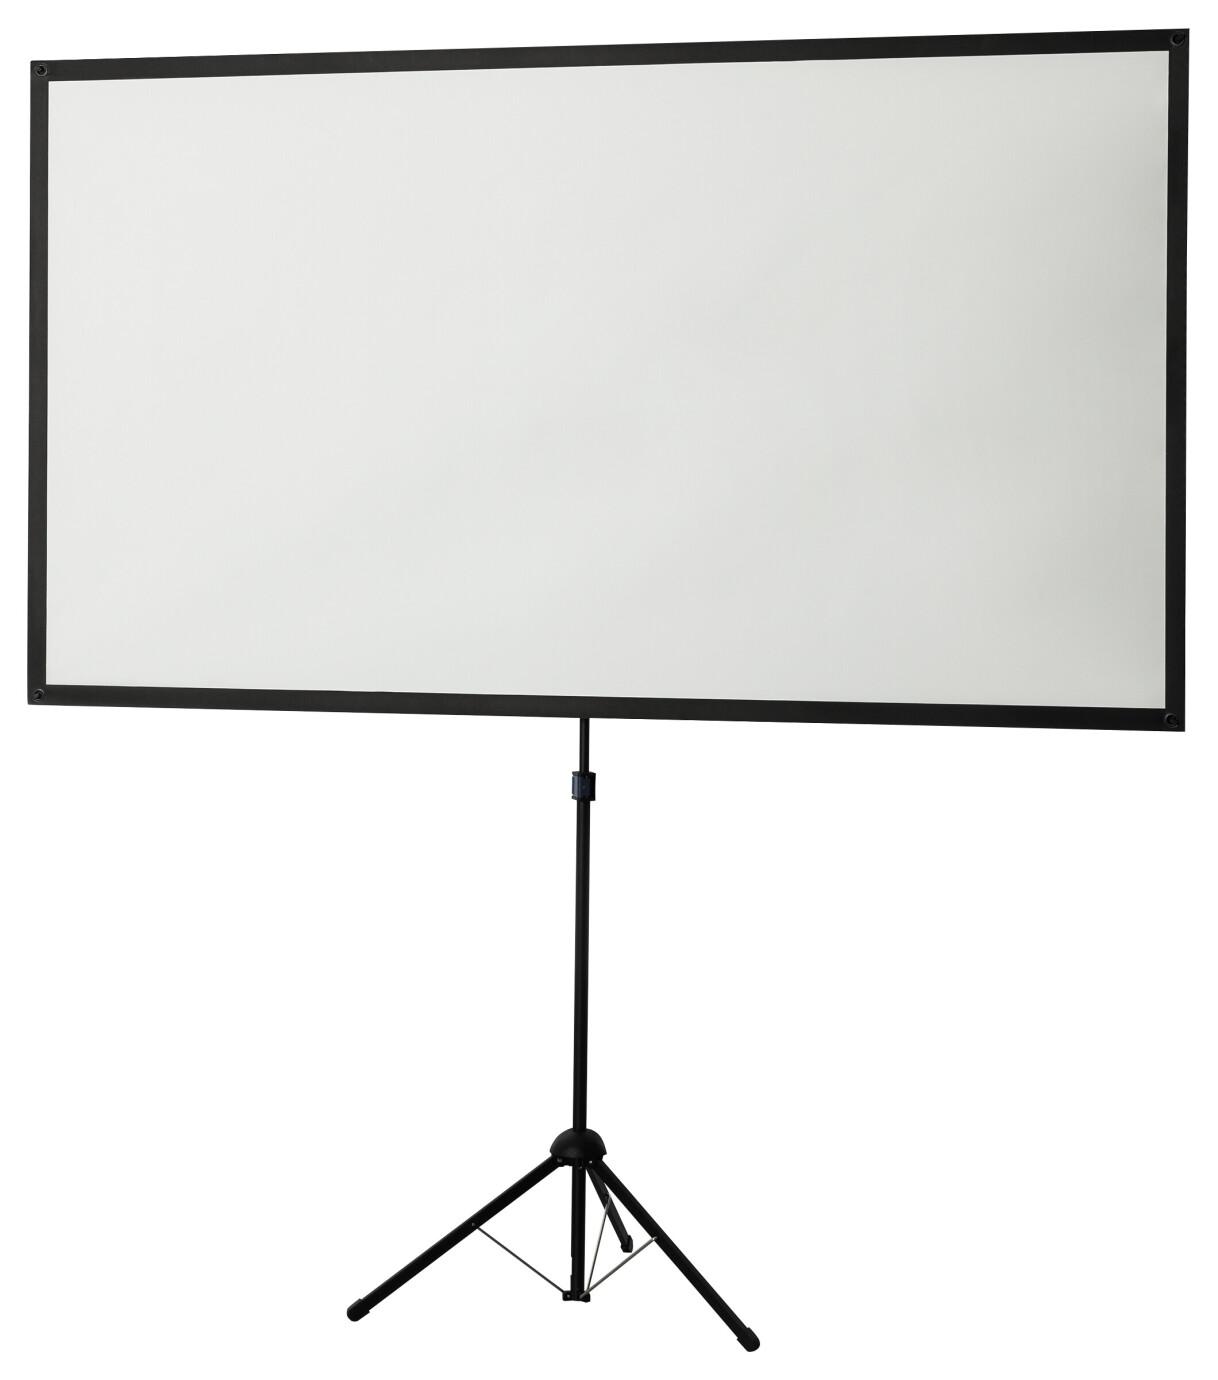 Pantalla de trípode celexon Ultra-ligera 177 x 100cm